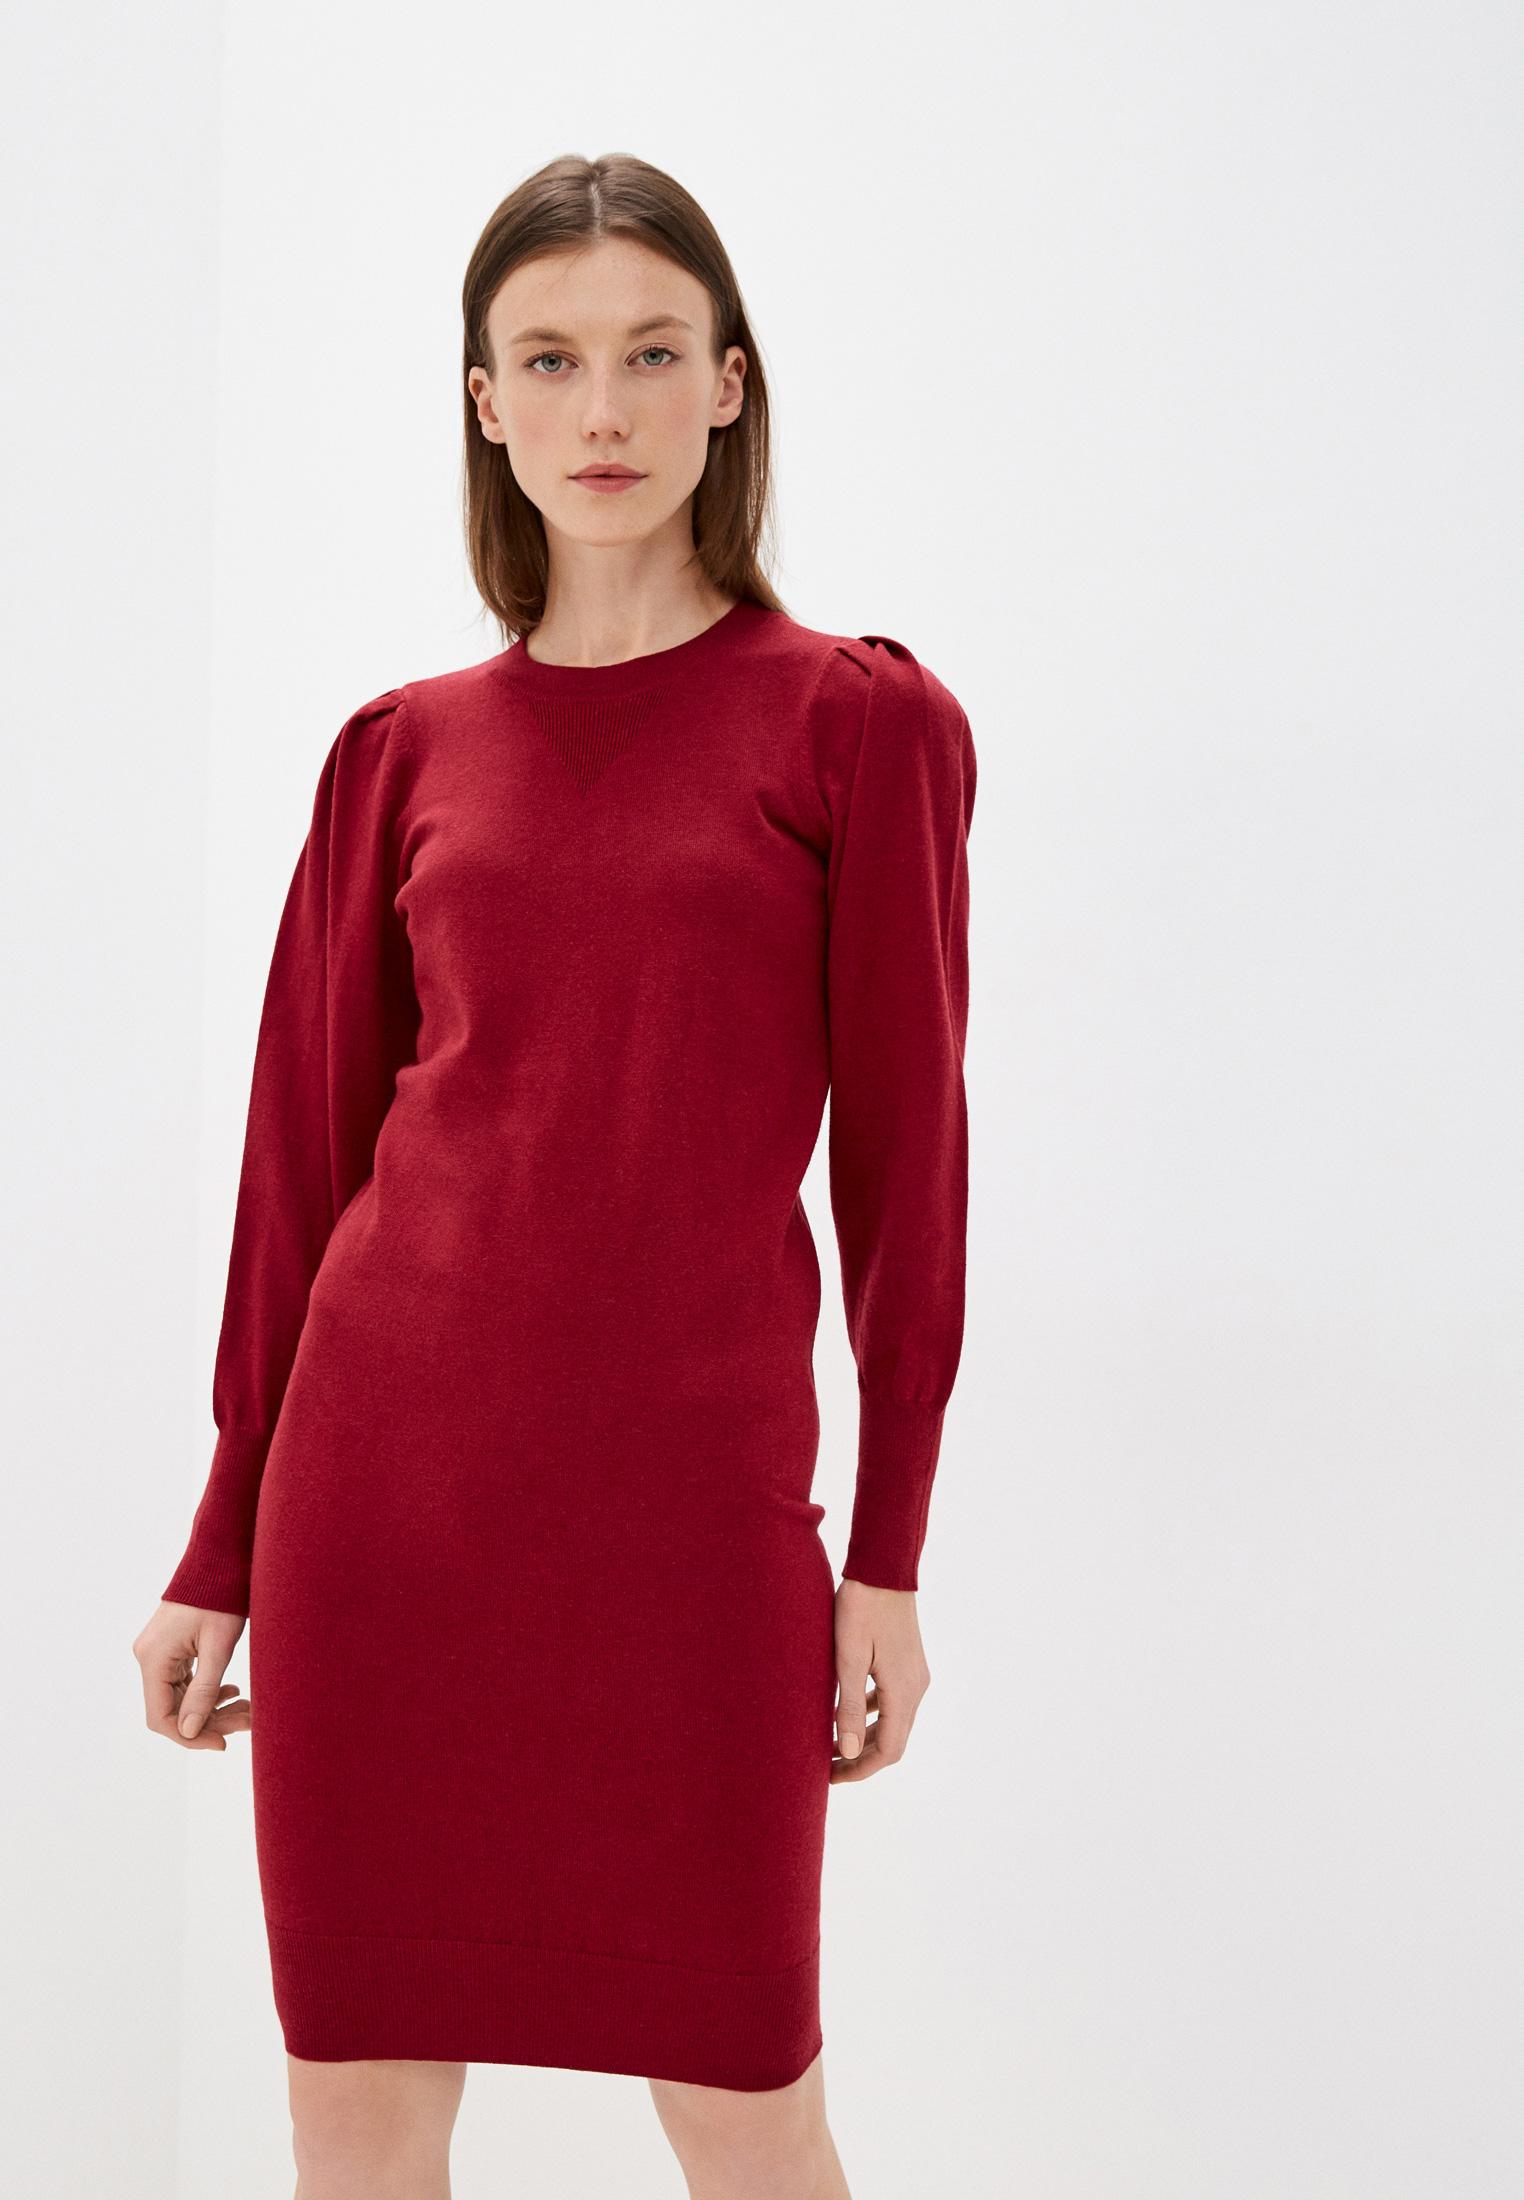 Вязаное платье Mexx (Мекс) Платье Mexx